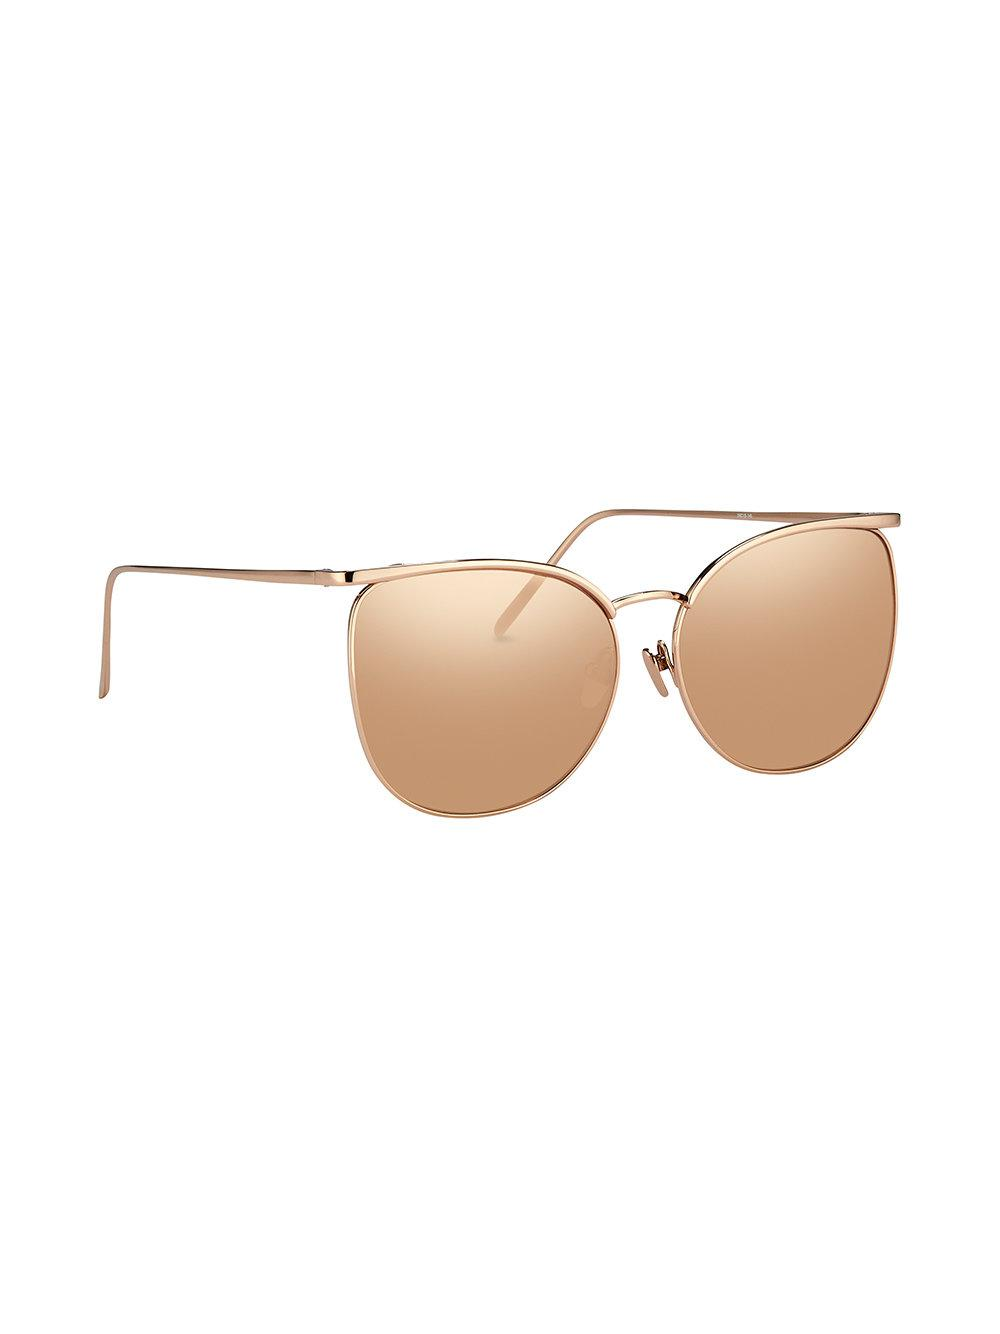 Save Sunglasses Linda Farrow In Metallic Shaped Oversized UxqUgwP0z